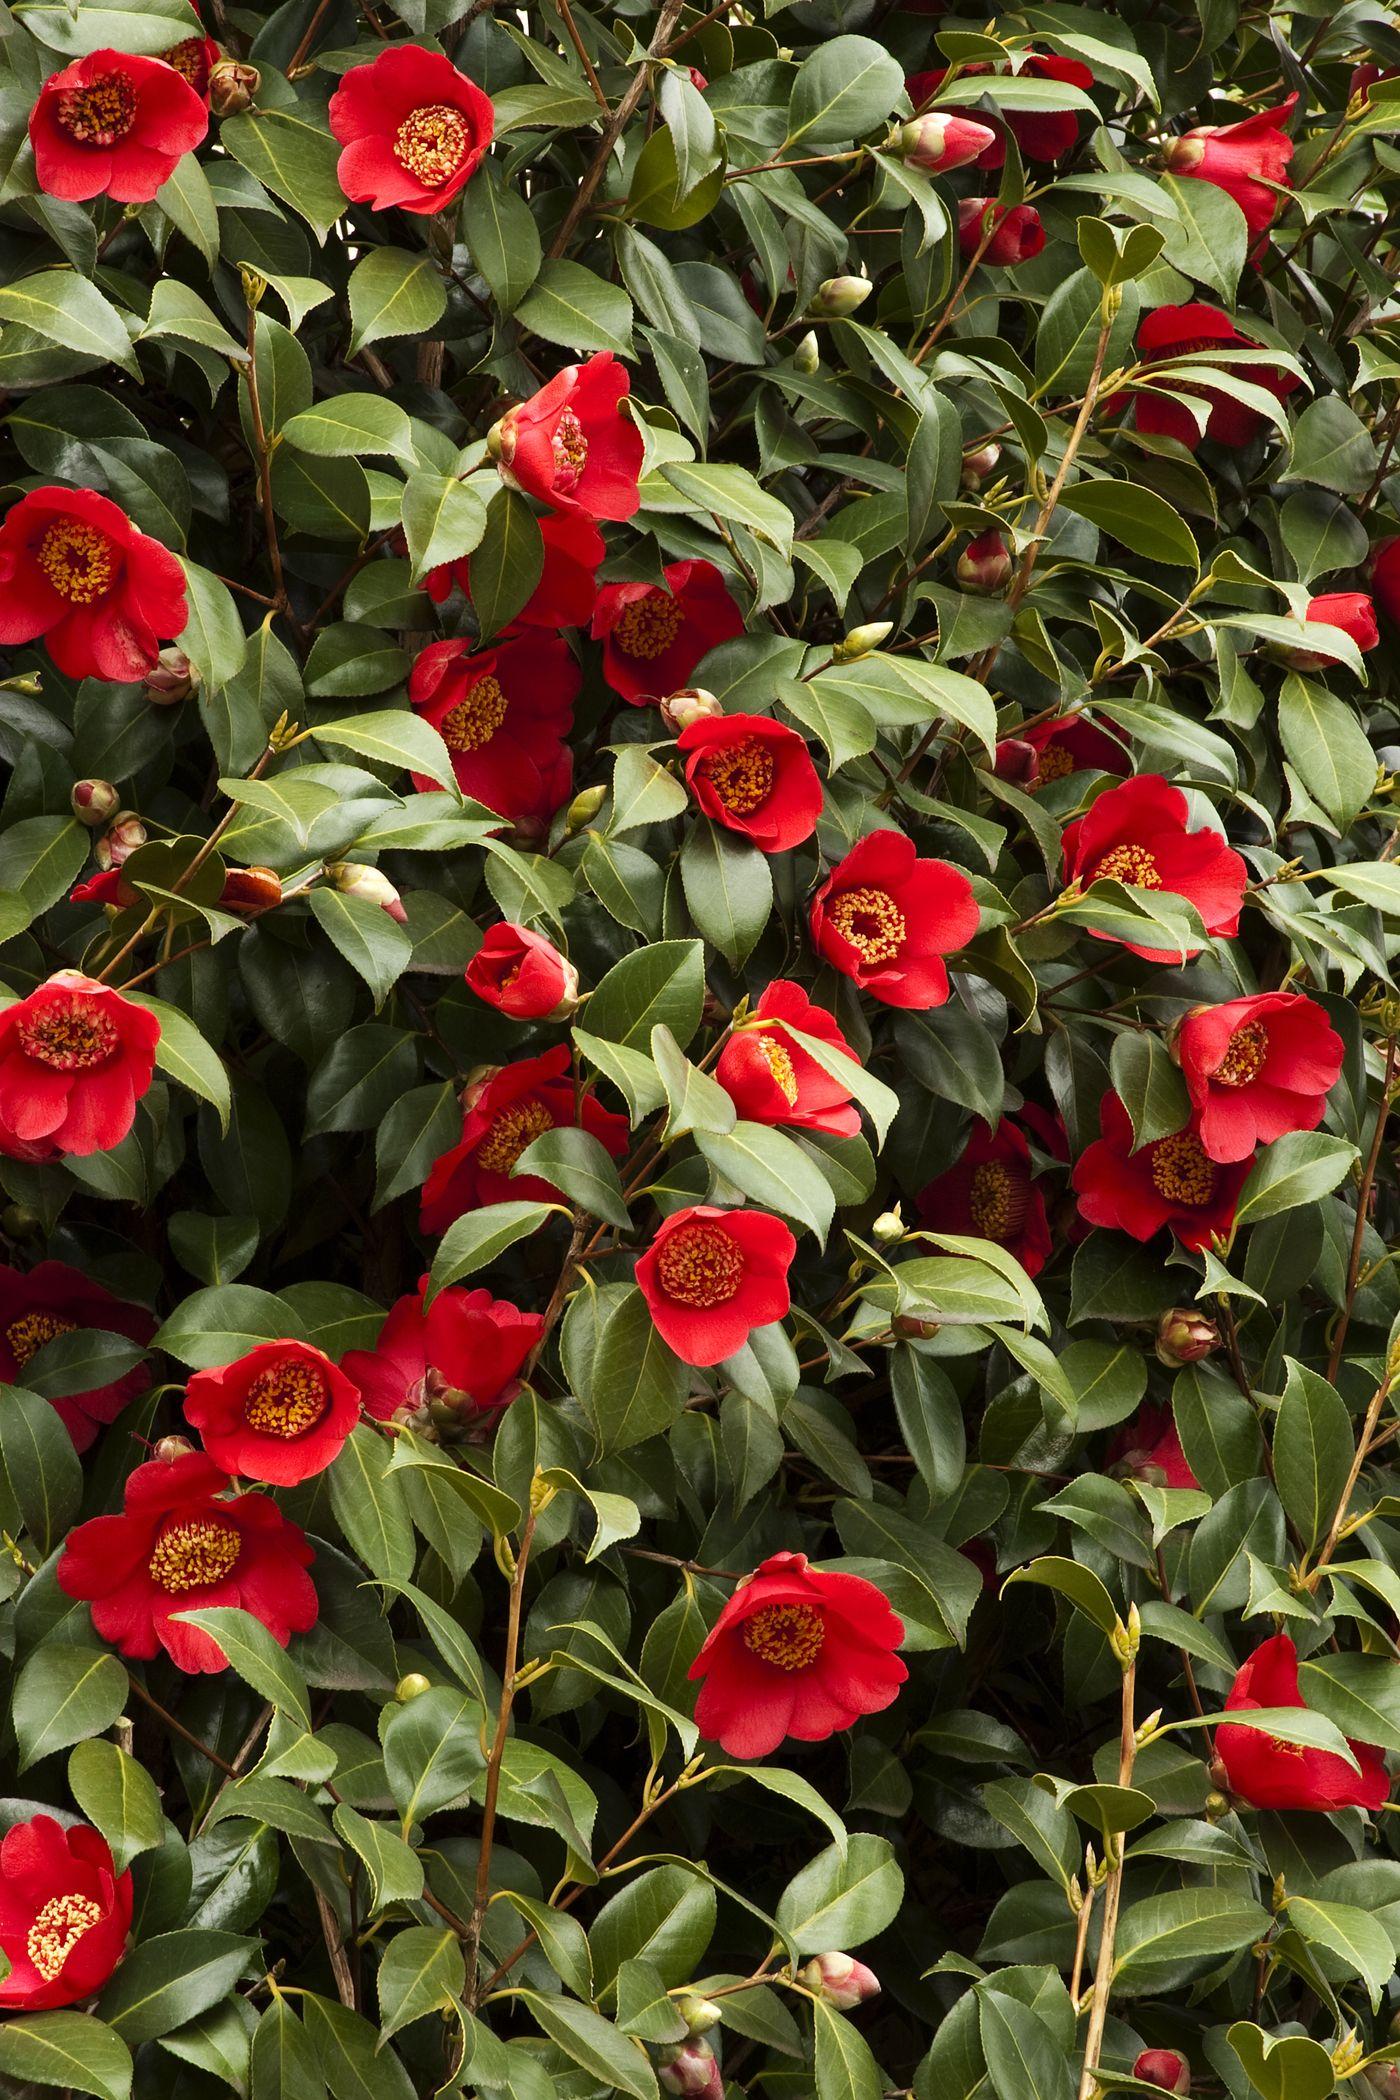 Spring S Promise Ice Angels Camellia Monrovia Spring S Promise Ice Angels Camellia Deer Resistant Plants Camellia Plant Japanese Flowers